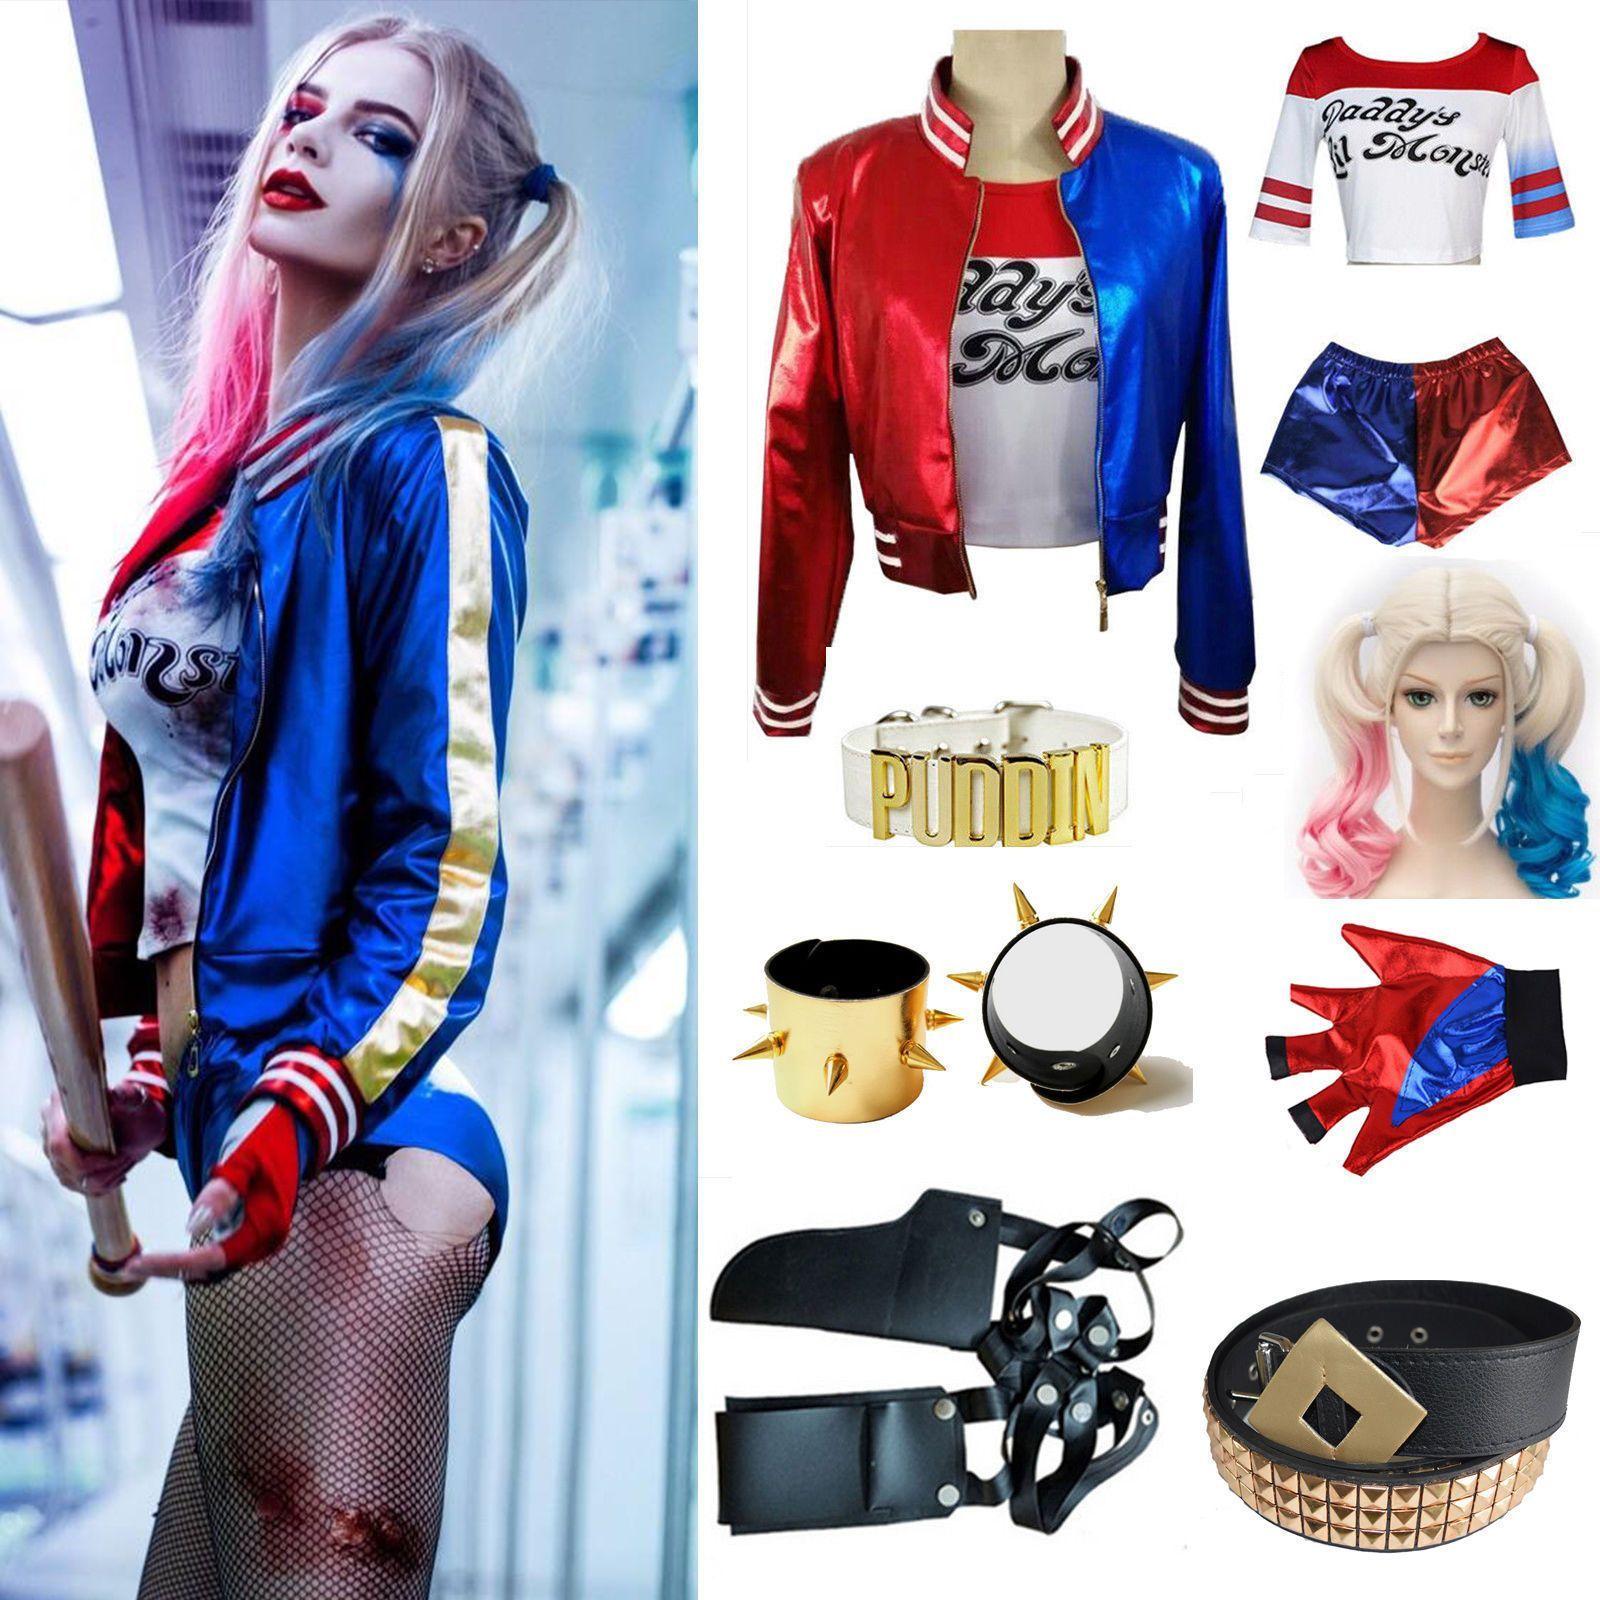 Adult Cosplay Harley Quinn Damen Kostüm Set Halloween Suicide Squad Outfit Party  | eBay - Werbung #Cosplay #Kostüm #Halloween #Fasching #Karneval #SuicideSquad #Harekin #Harleyquinn #harleyquinn